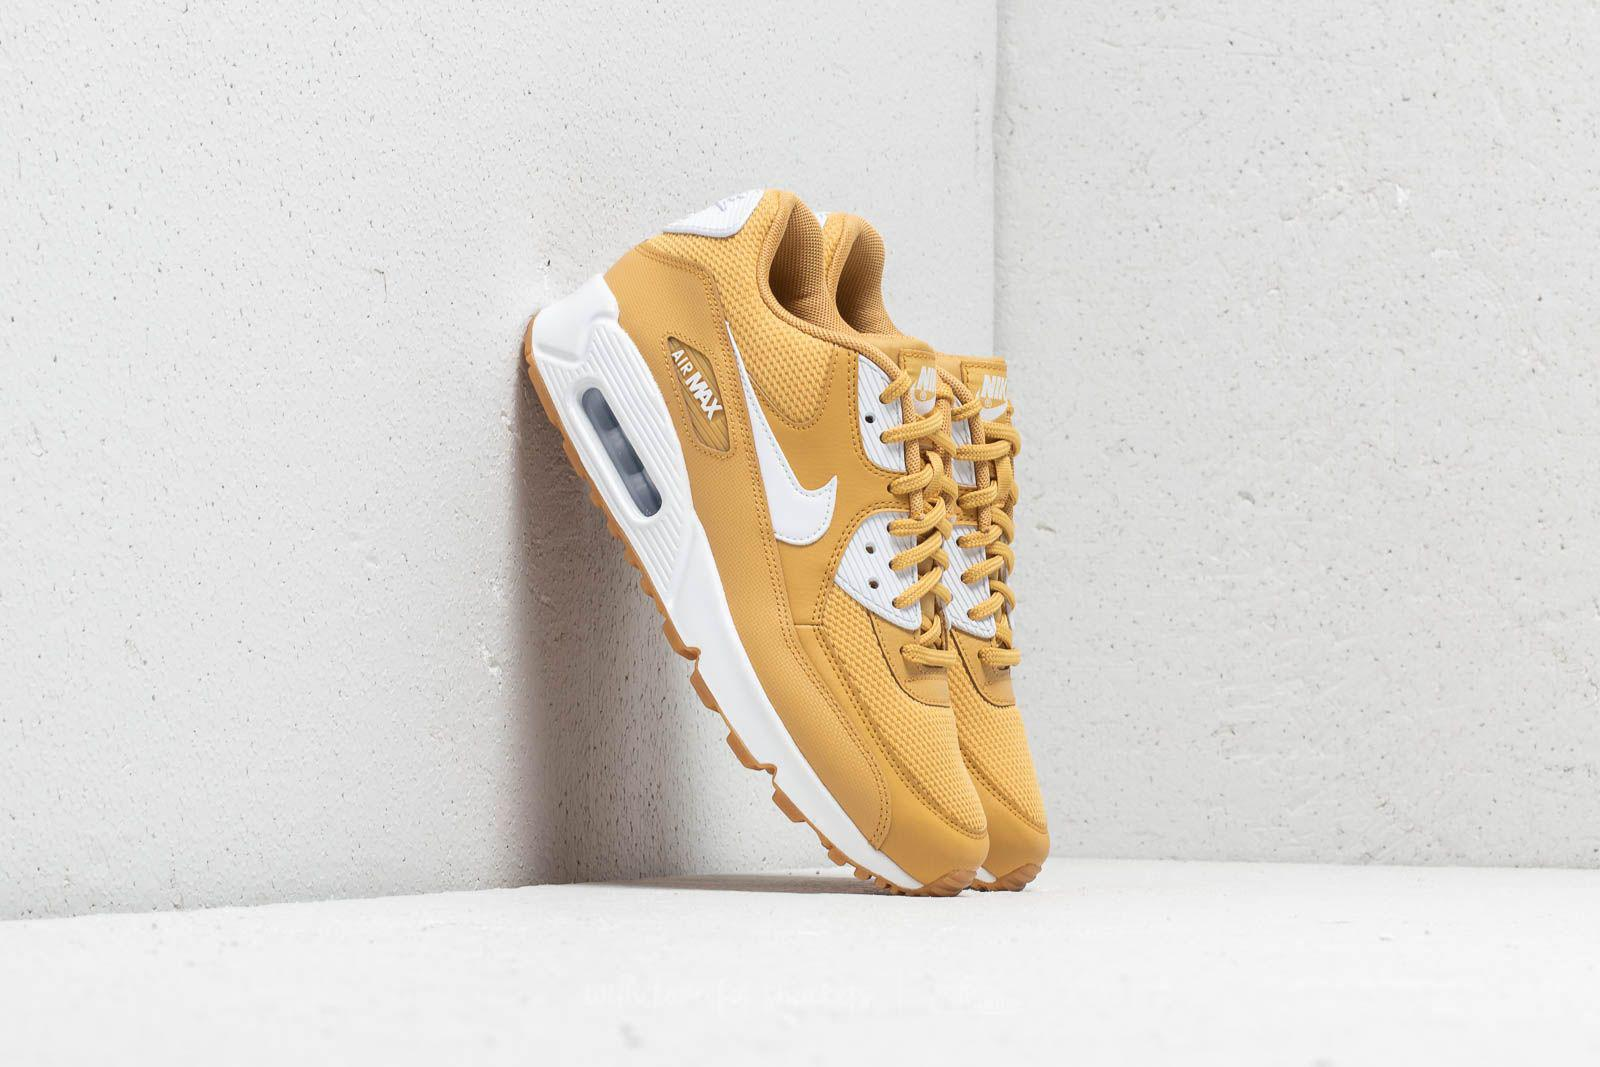 d92b37f7263 Lyst - Nike Wmns Air Max 90 Wheat Gold  White in Metallic